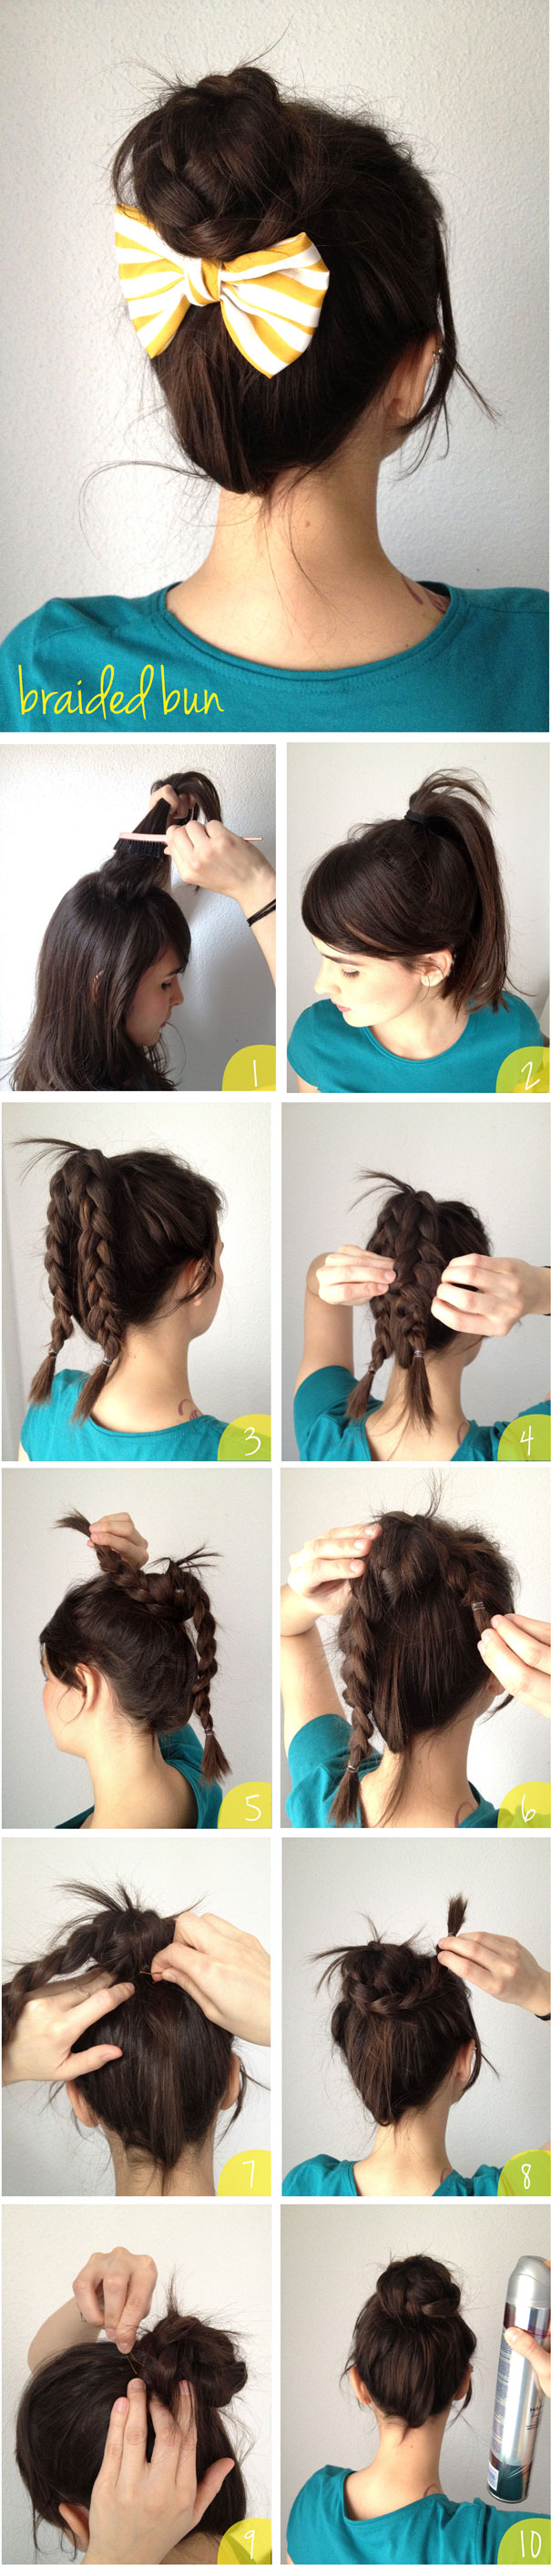 braided bun how-to